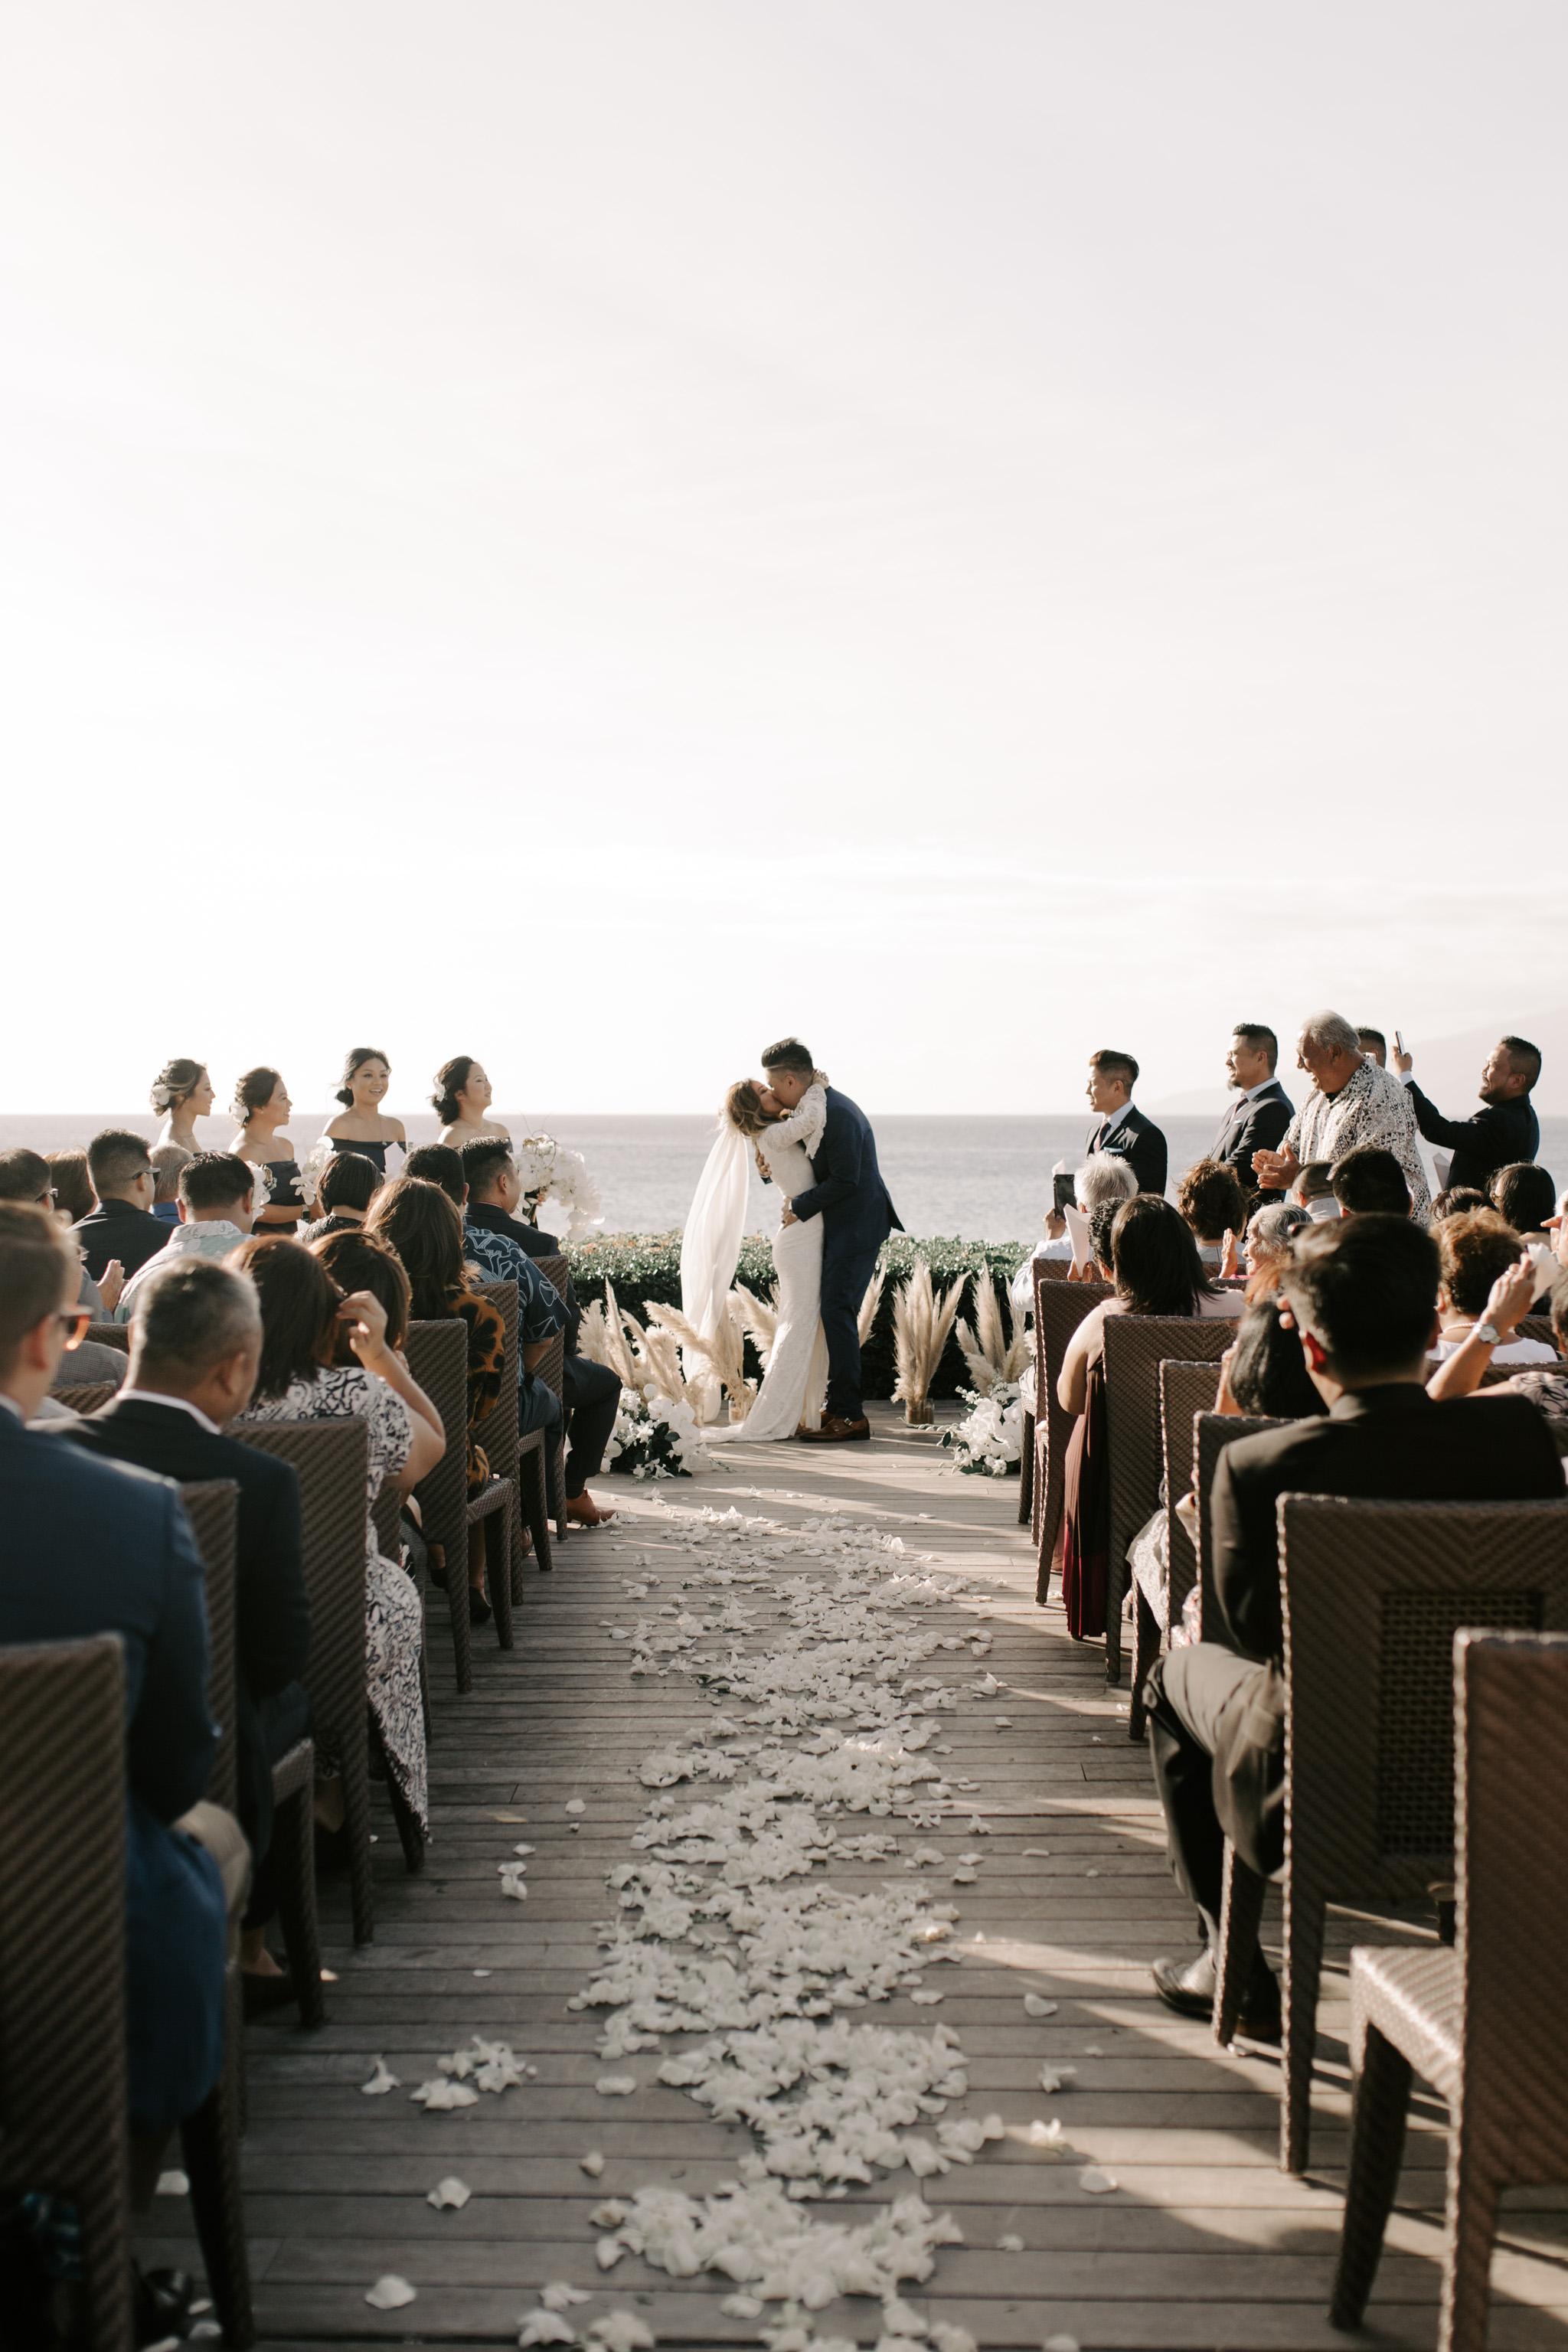 First kiss as husband and wife   Merriman's Kapalua Maui wedding by Hawaii wedding photographer Desiree Leilani